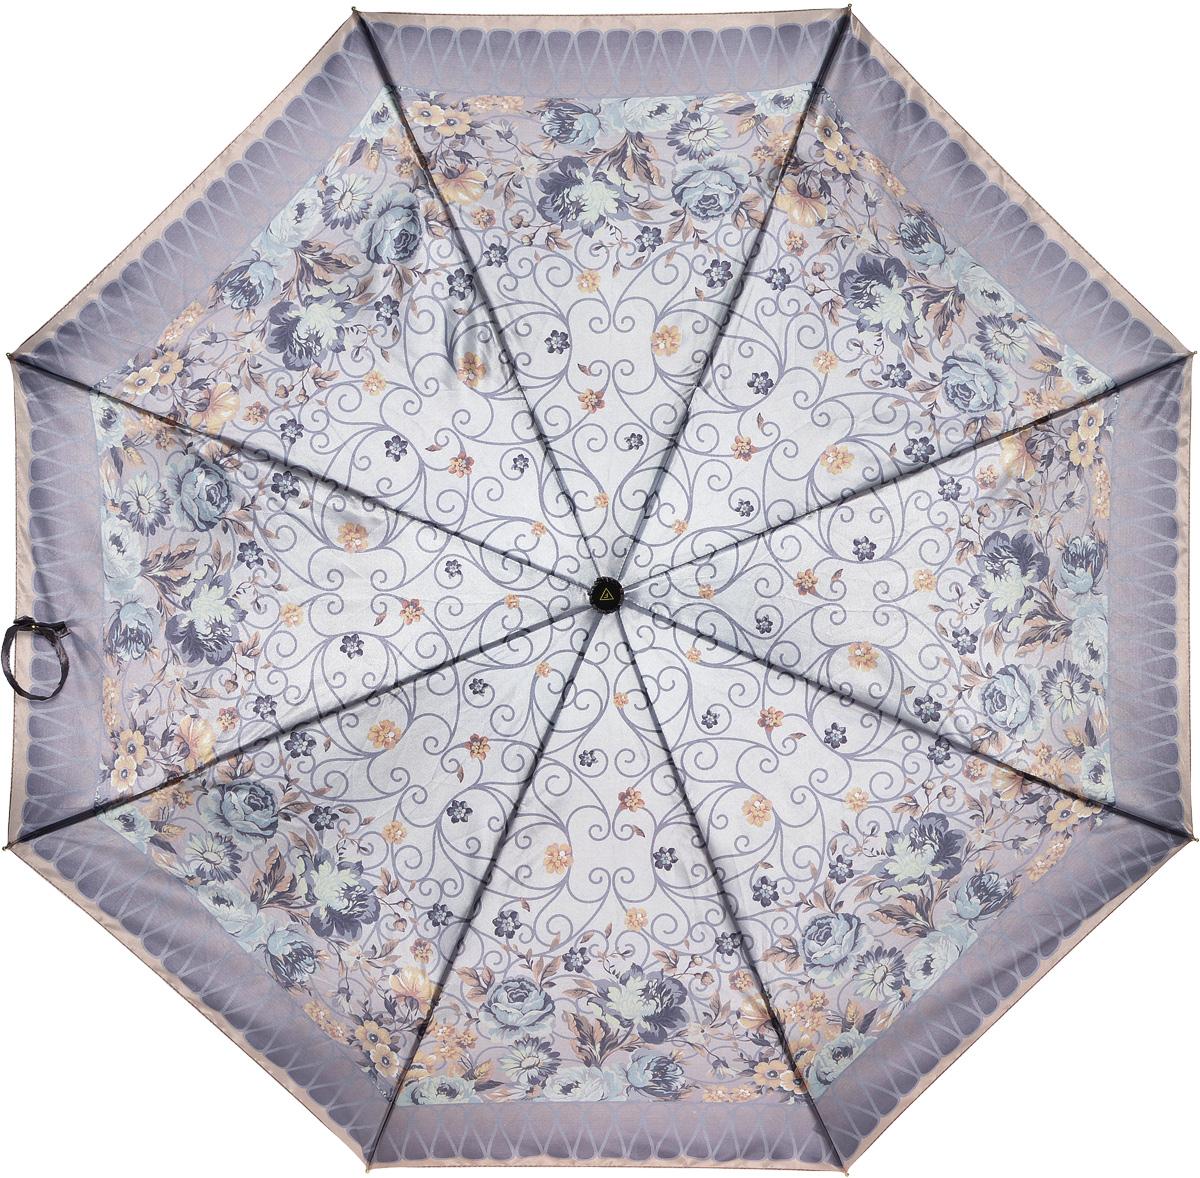 Зонт женский Fabretti, автомат, 3 сложения. L-16107-4L-16107-4Зонт женский Fabretti, облегченный суперавтомат, 3 сложения